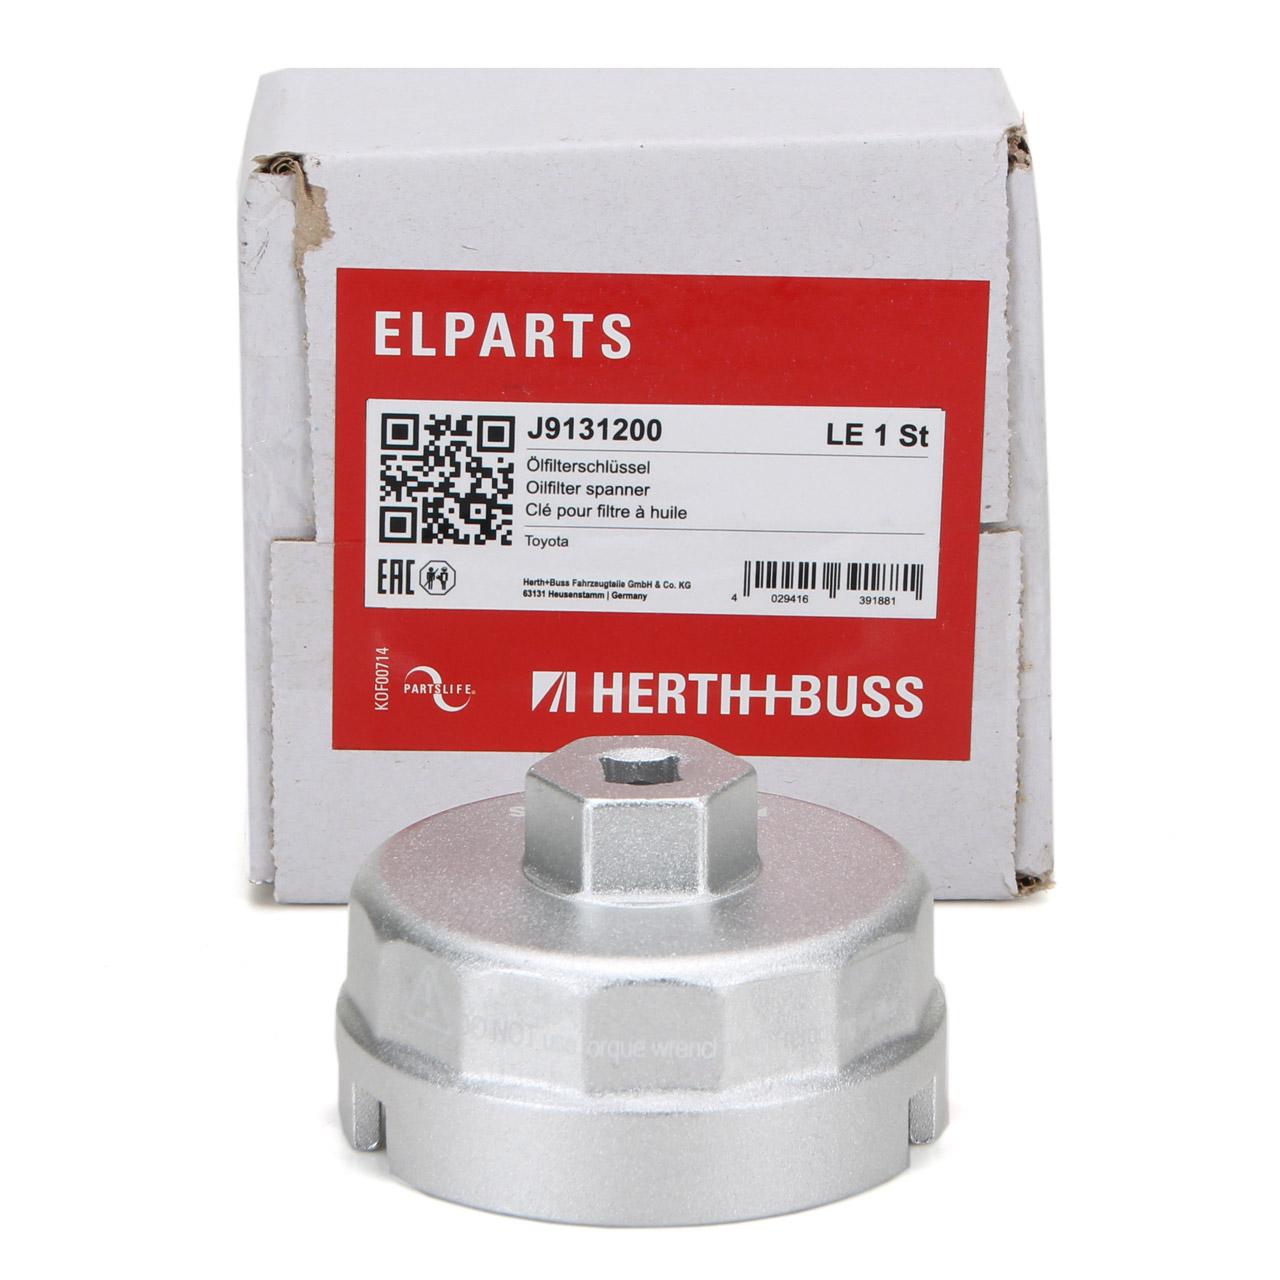 HERTH+BUSS JAKOPARTS Ölfilterdeckel Ölfilterschlüssel LEXUS CT TOYOTA Auris